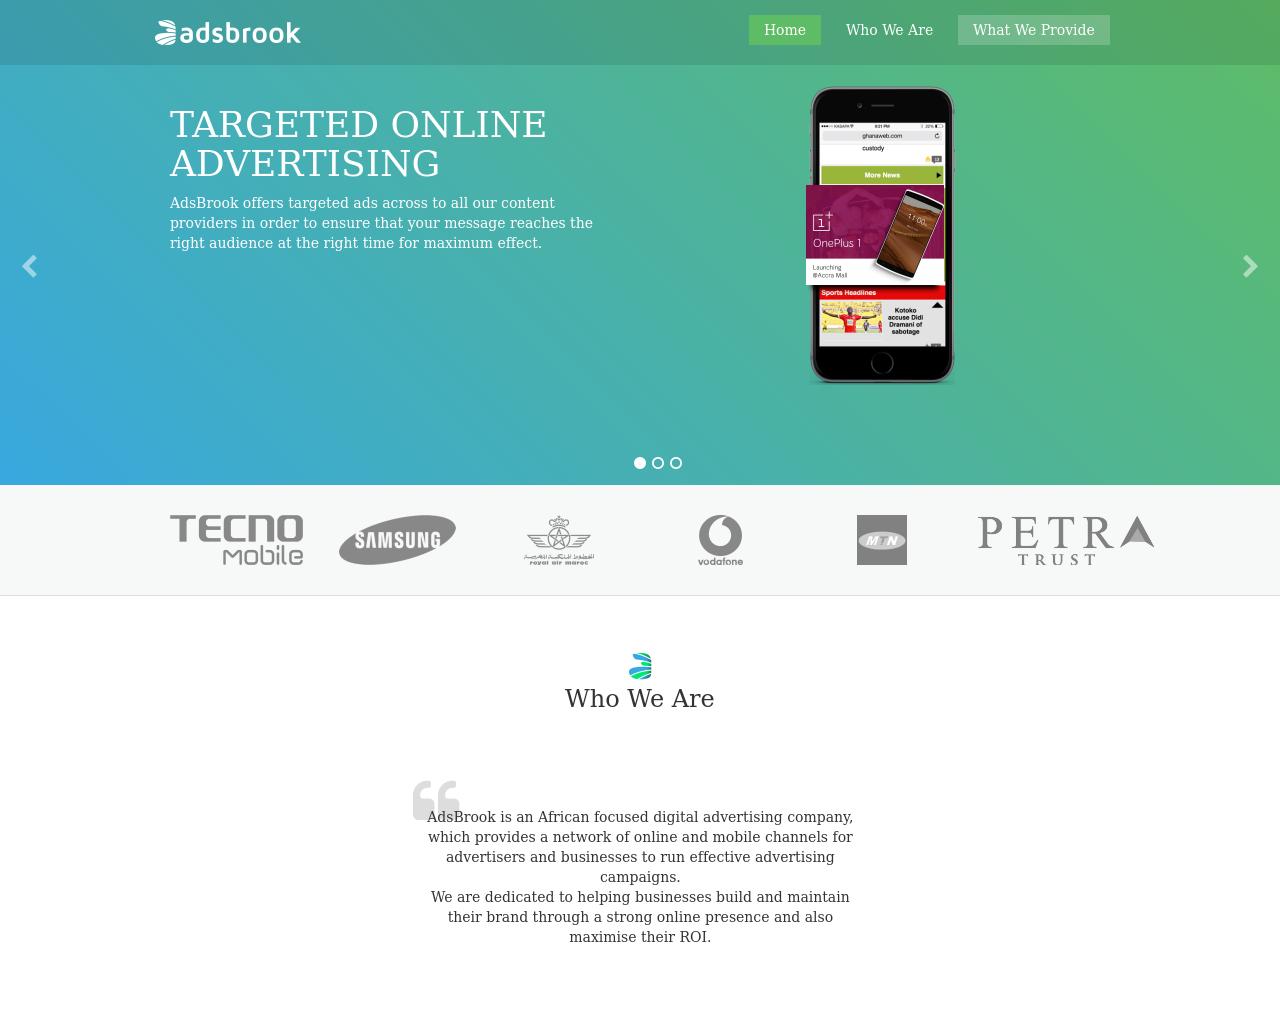 AdsBrook-Advertising-Reviews-Pricing